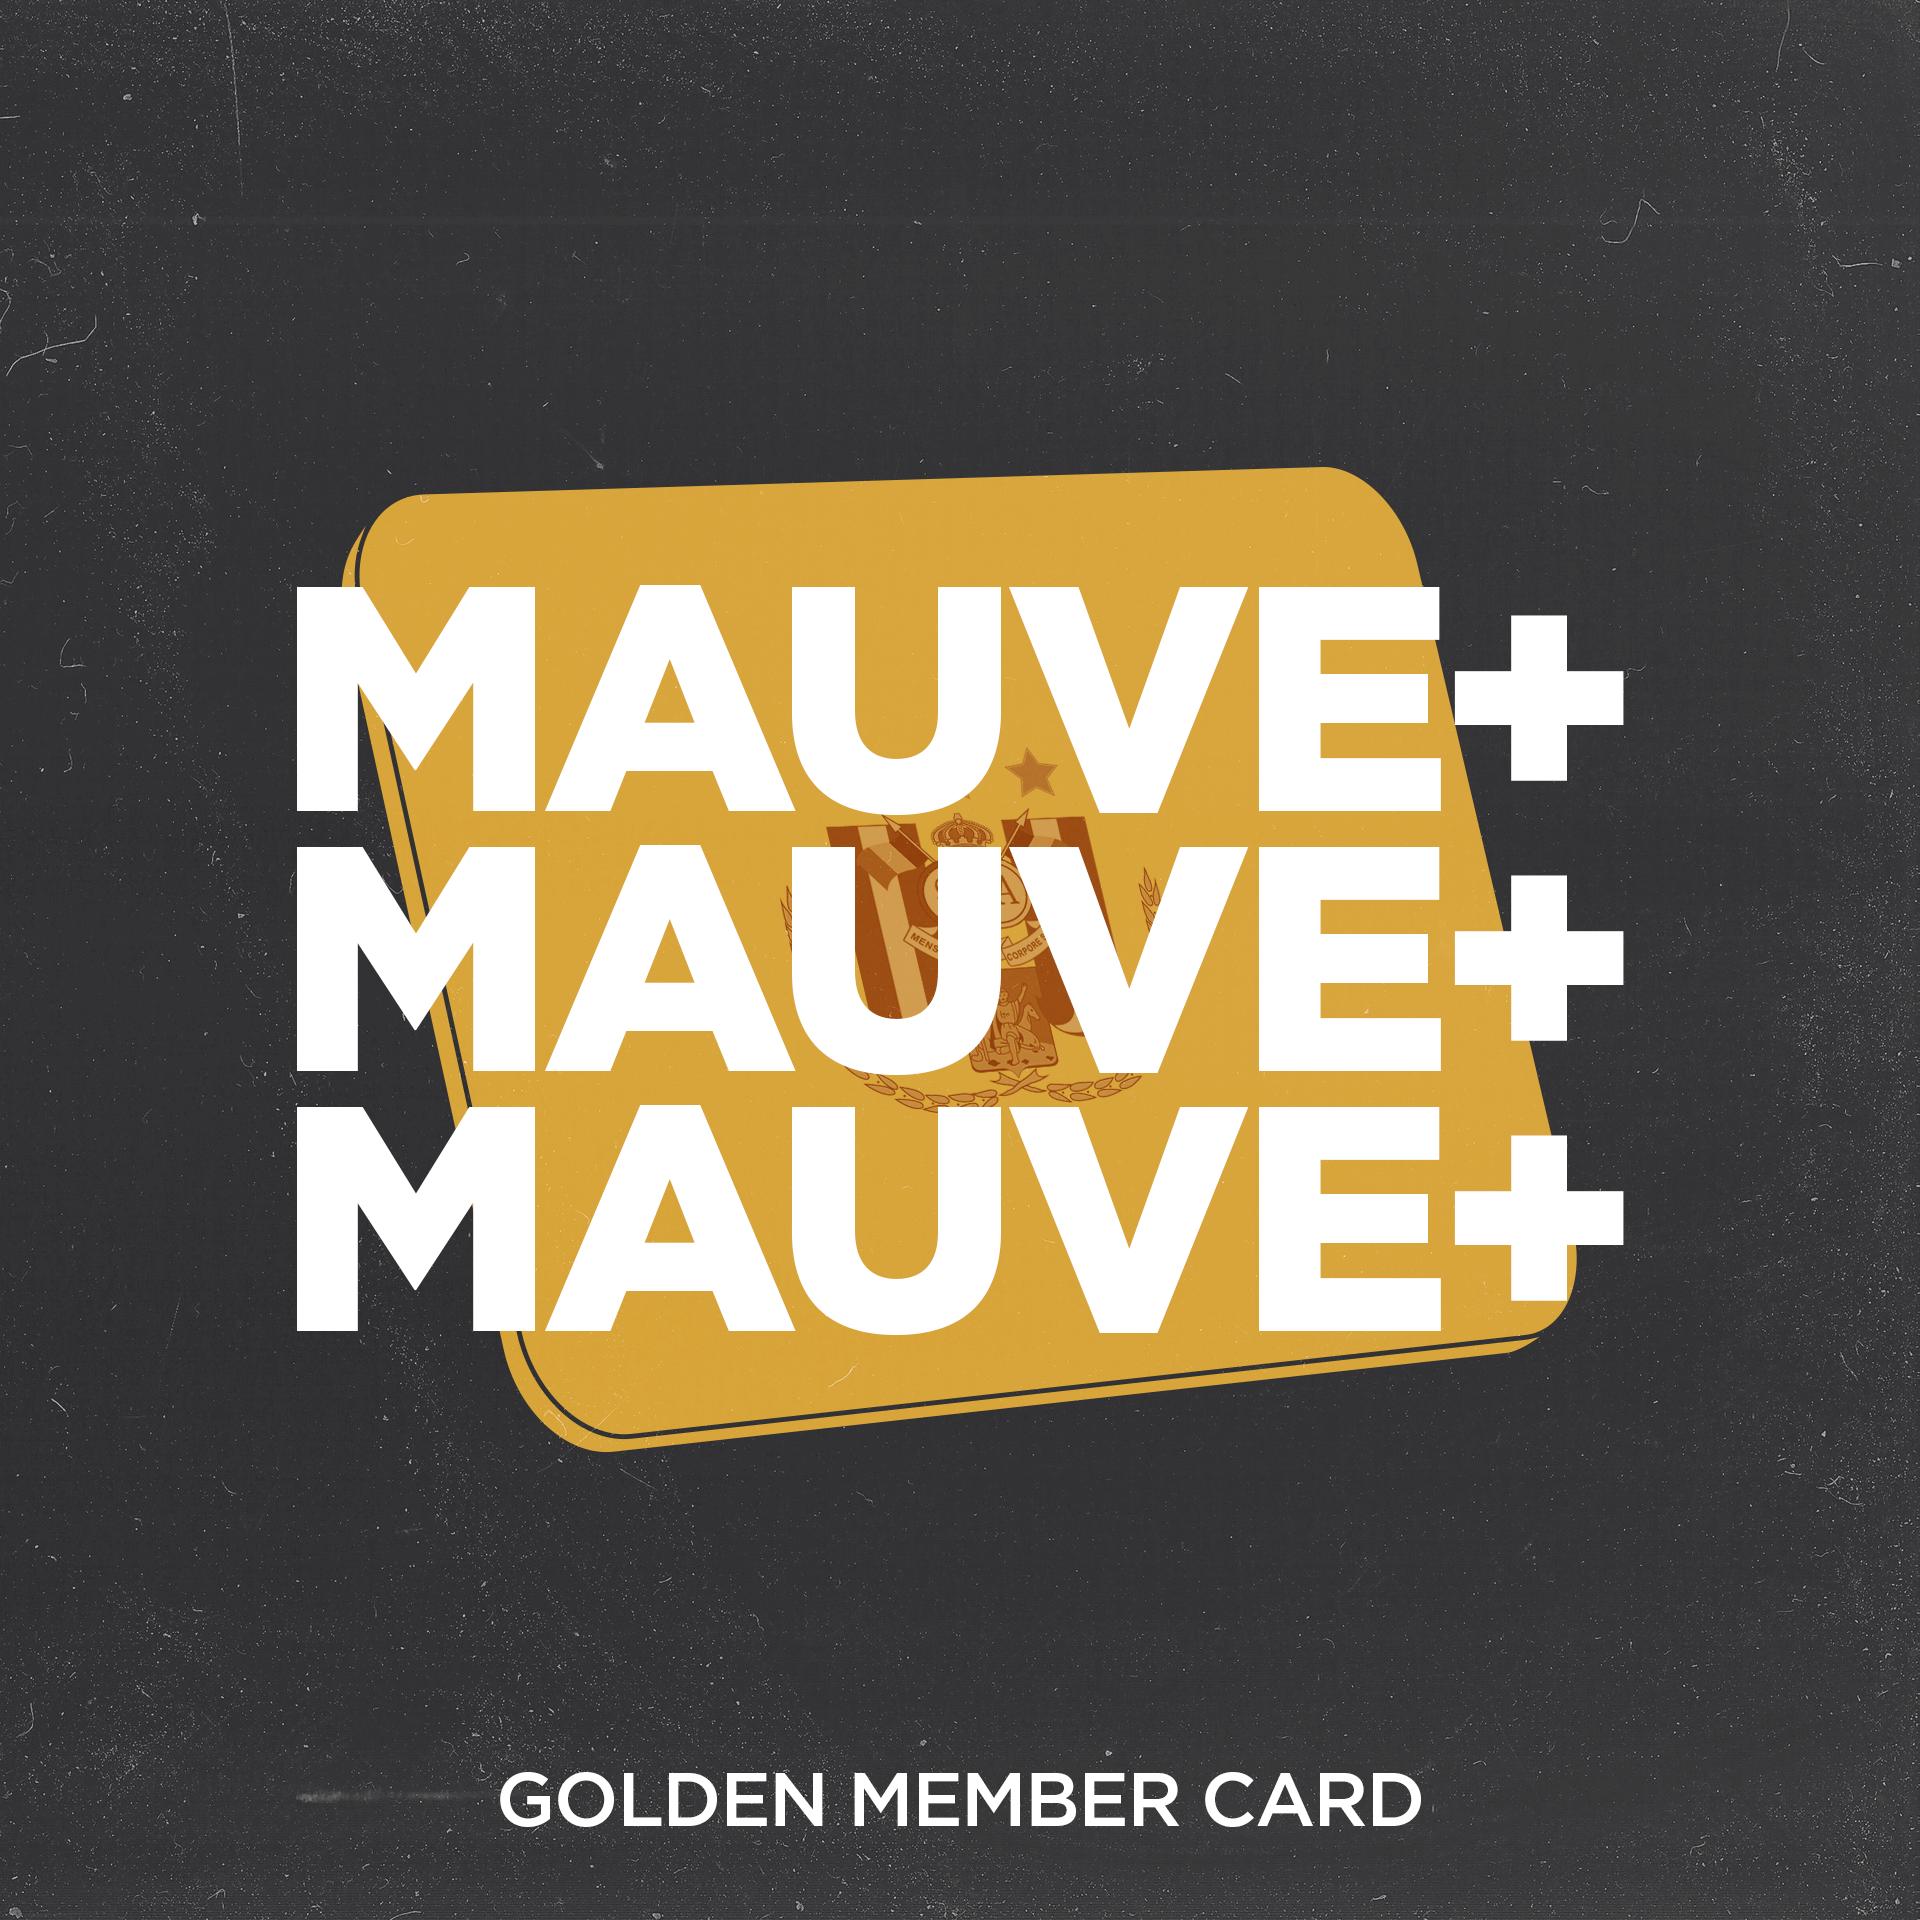 Mauve+